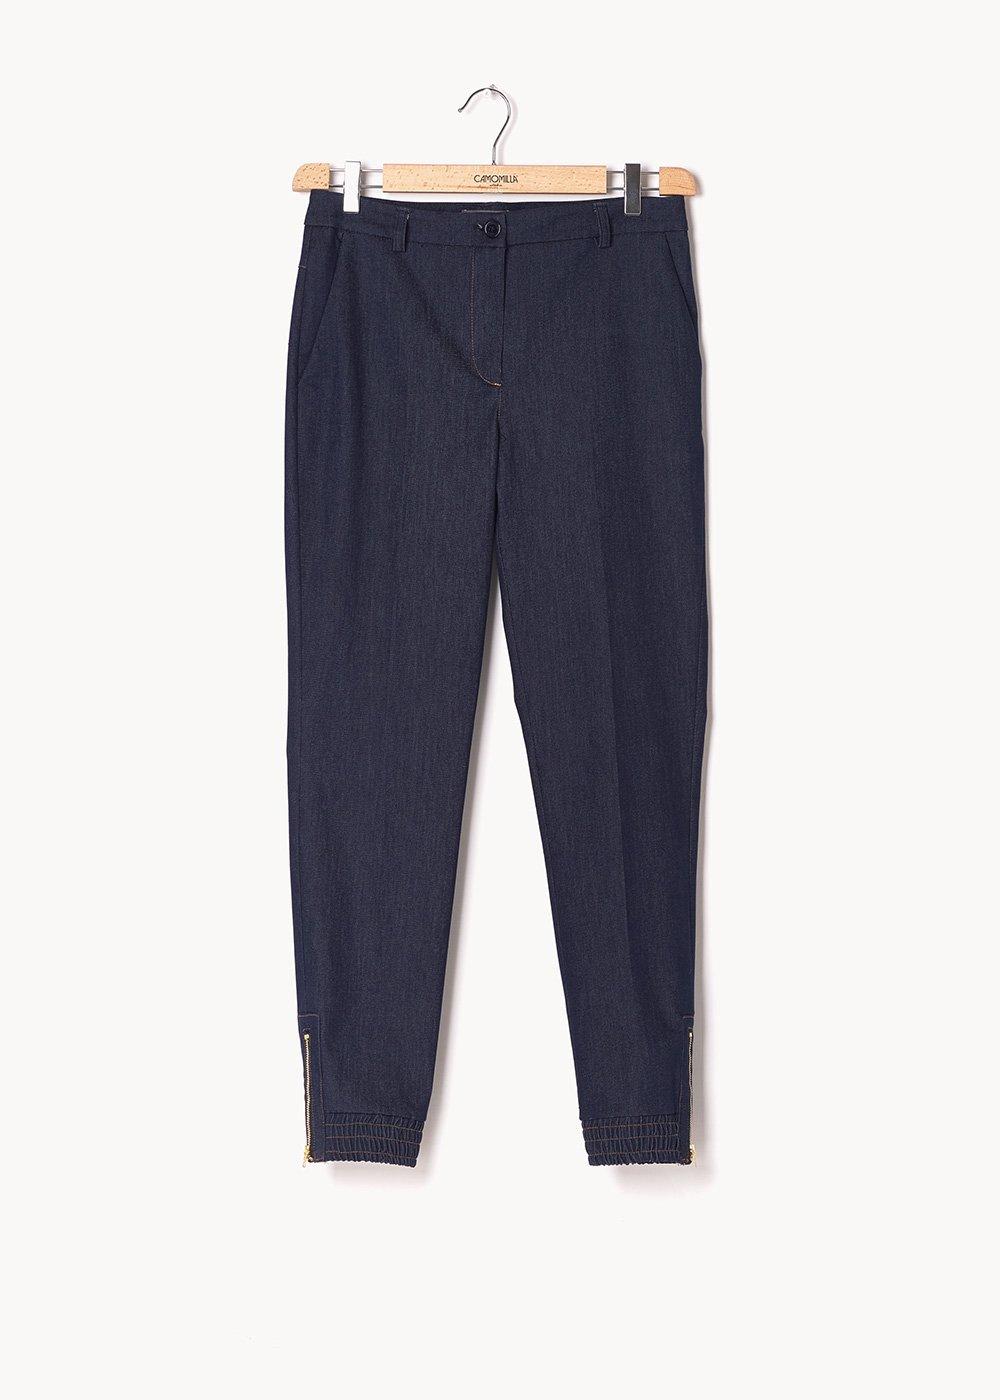 Jane trousers with denim effect - Dark Denim - Woman